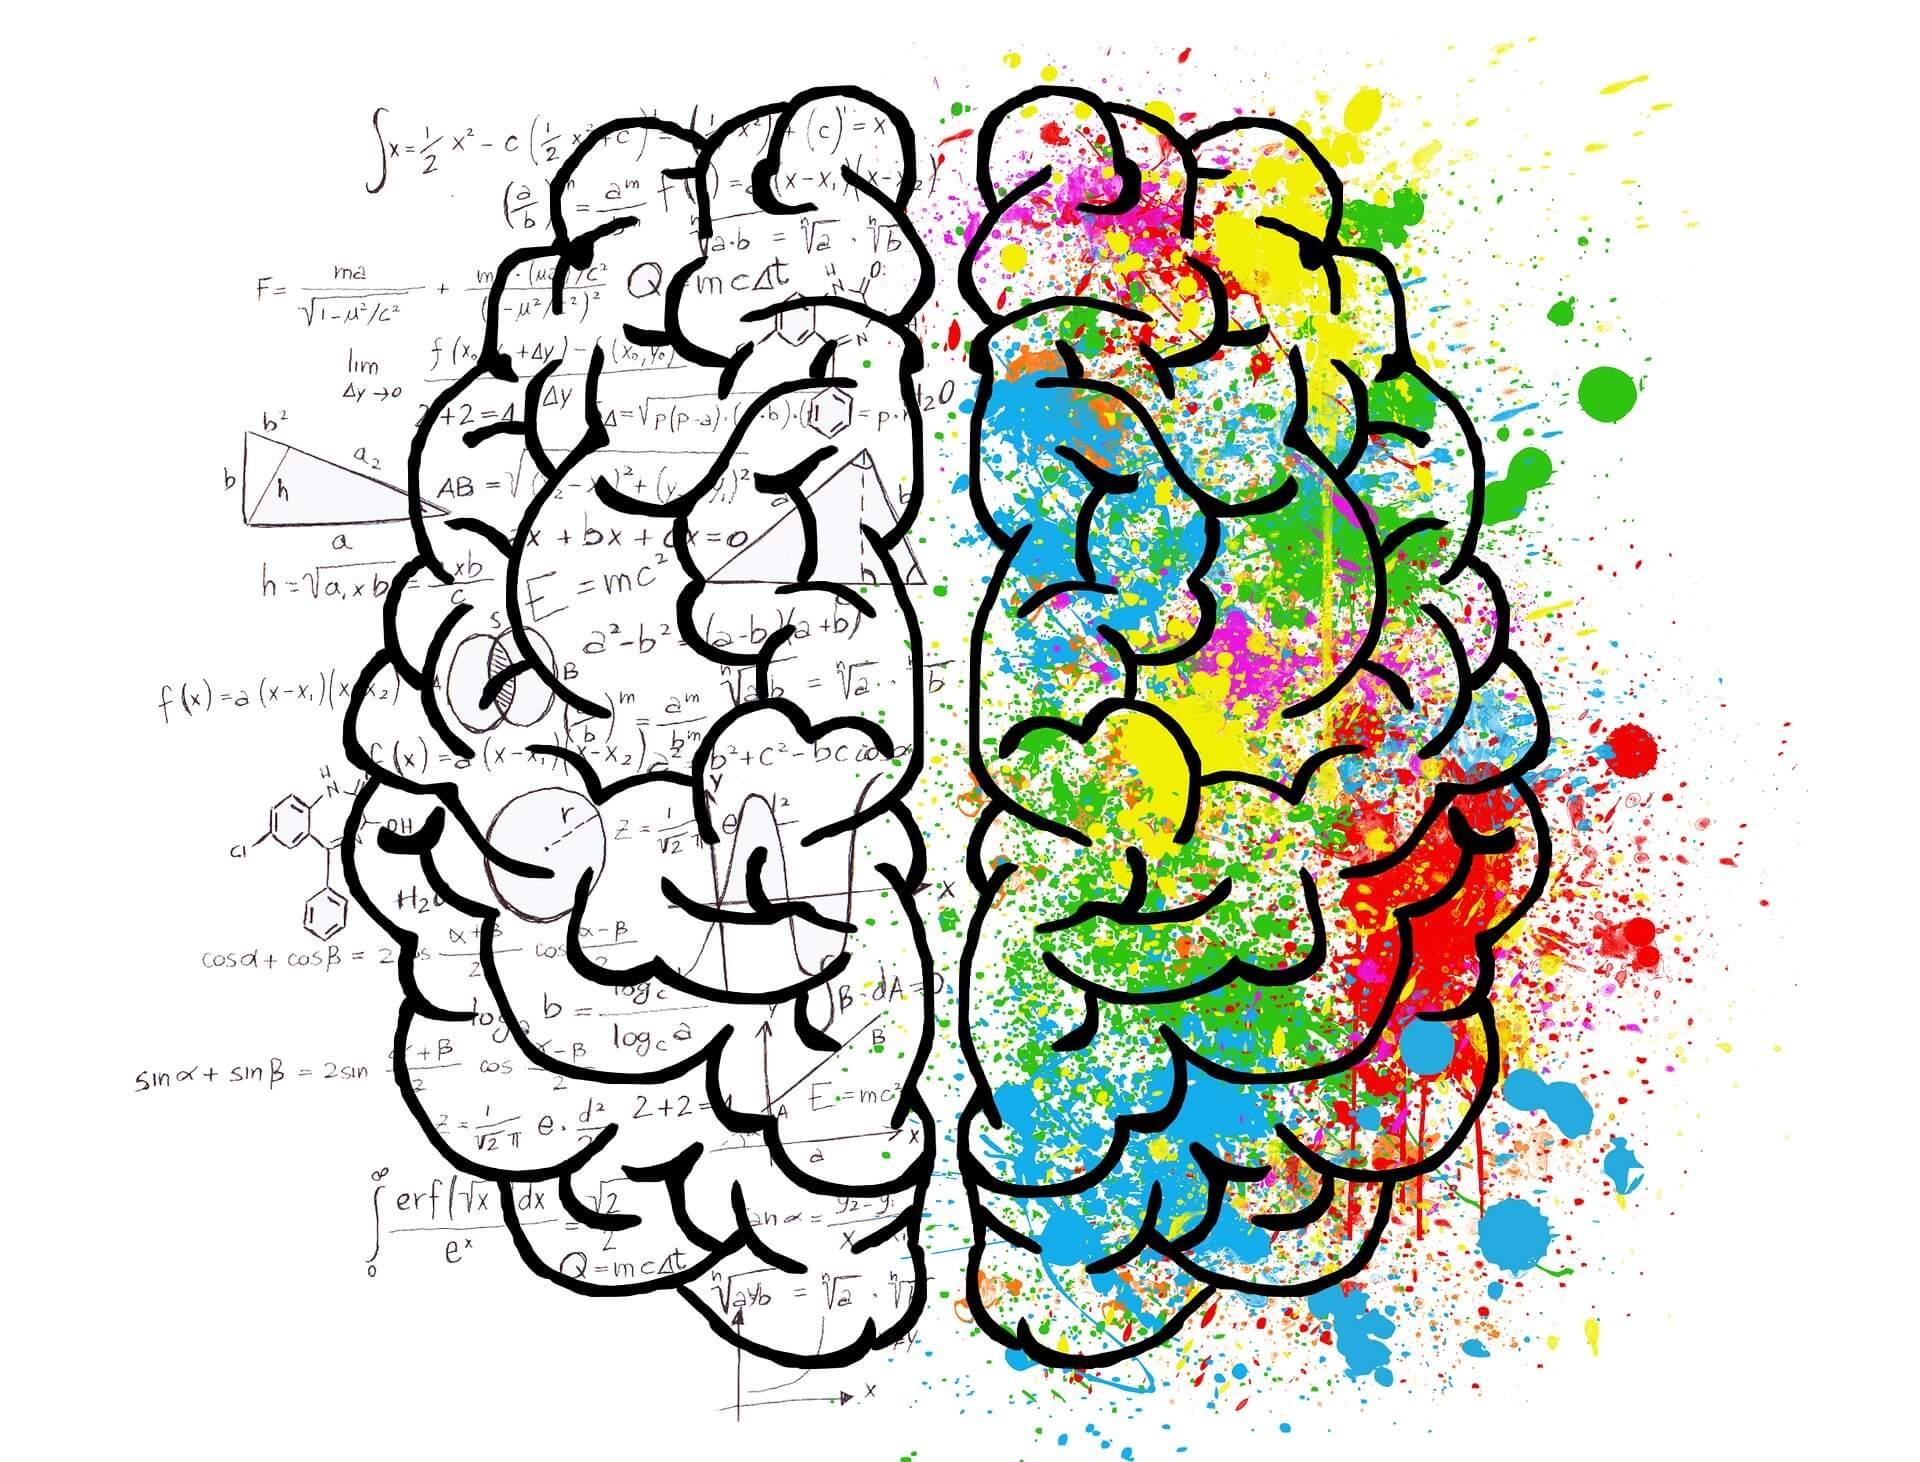 How to reprogram subconscious mind